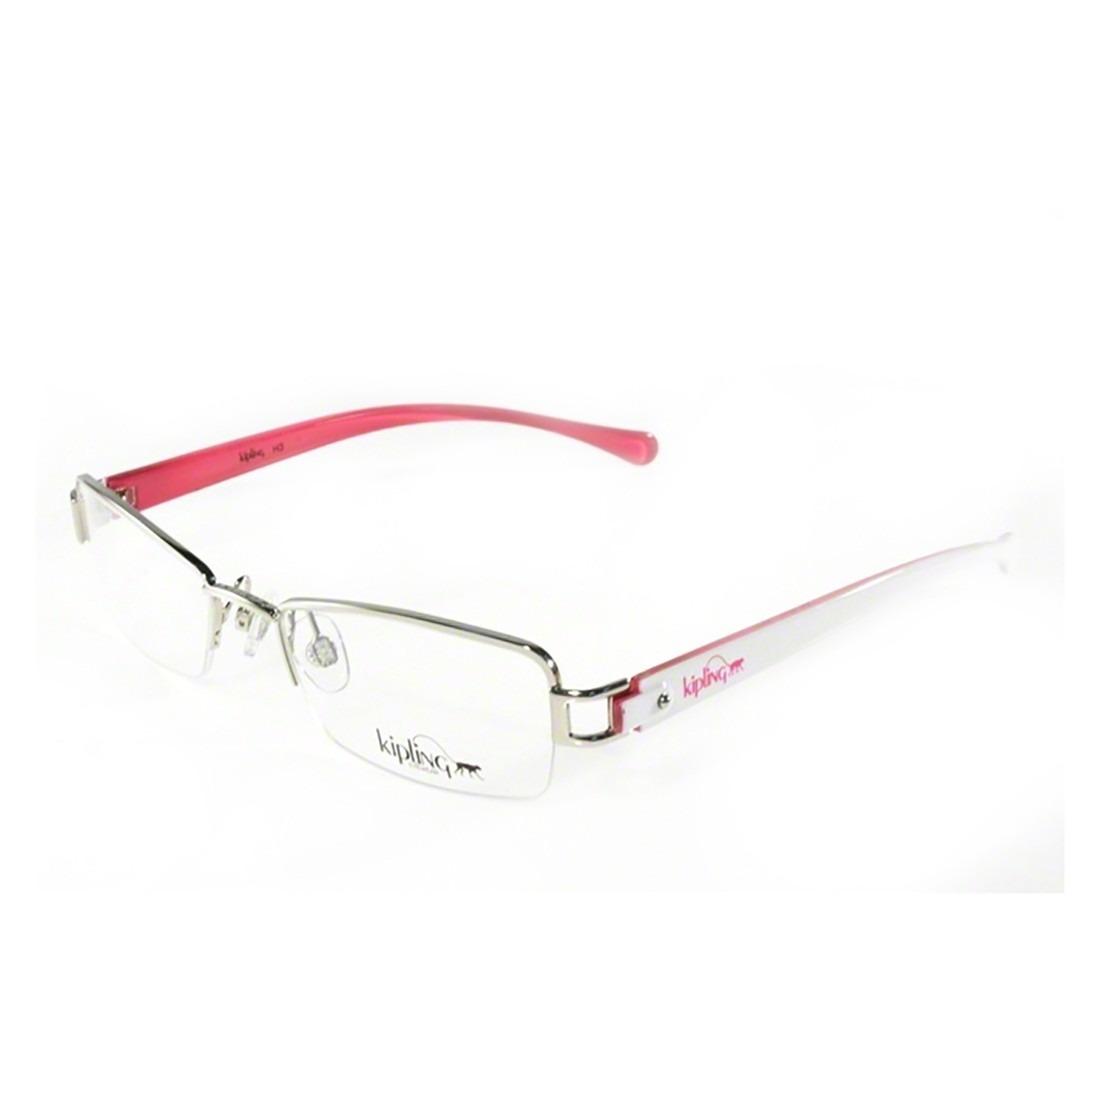 398b9b449 Kipling Kp 1078 Óculos De Grau - R$ 218,40 em Mercado Livre